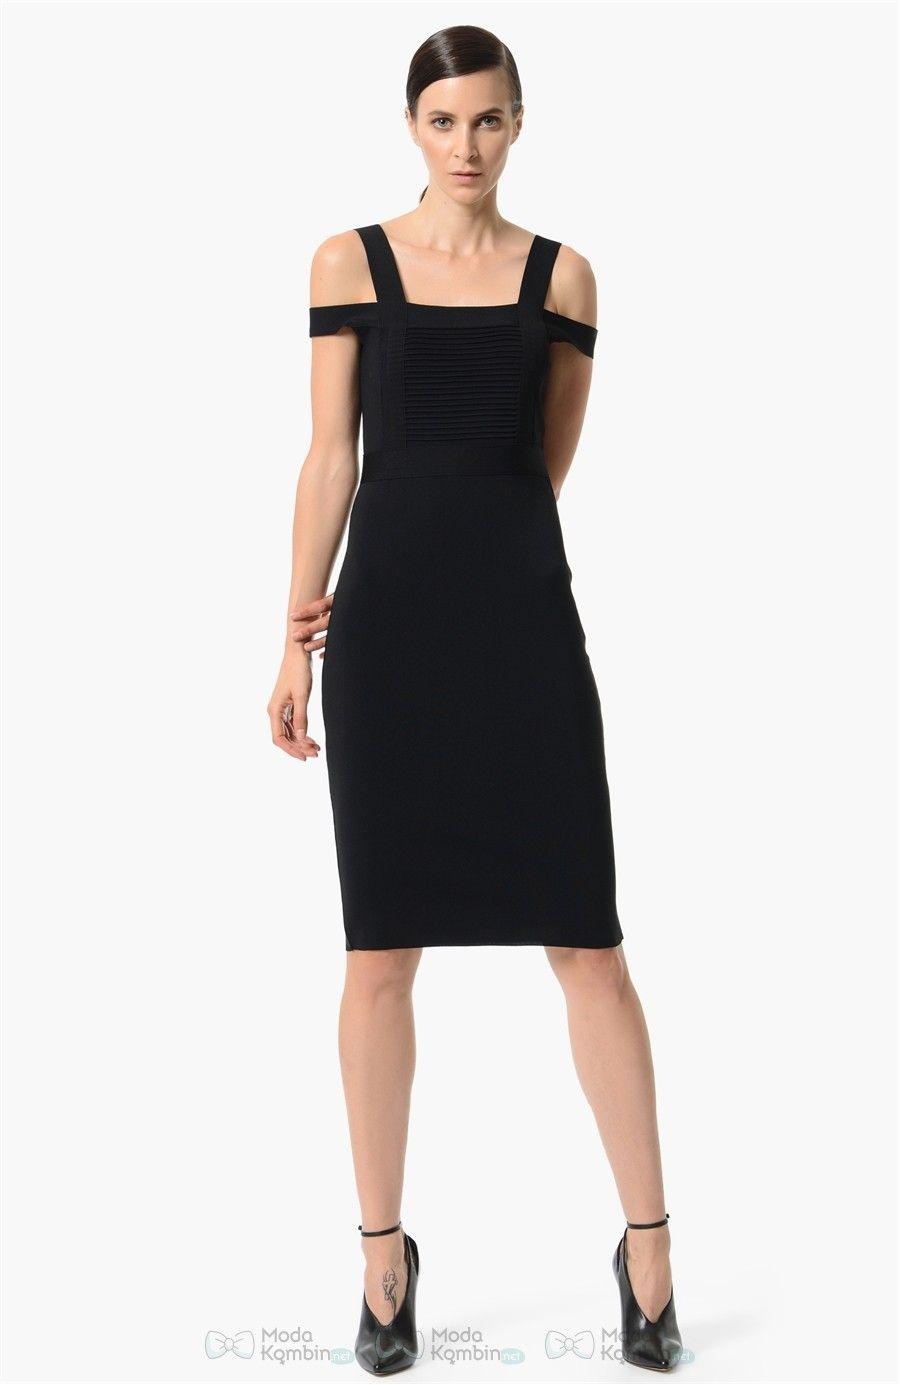 2017 Network Bayan Elbise Modelleri 2017networkbayanelbisemodasi 2017networkbayanelbisemodelleri Gunlukelbisemo Elbise Modelleri Elbise Siyah Kisa Elbise